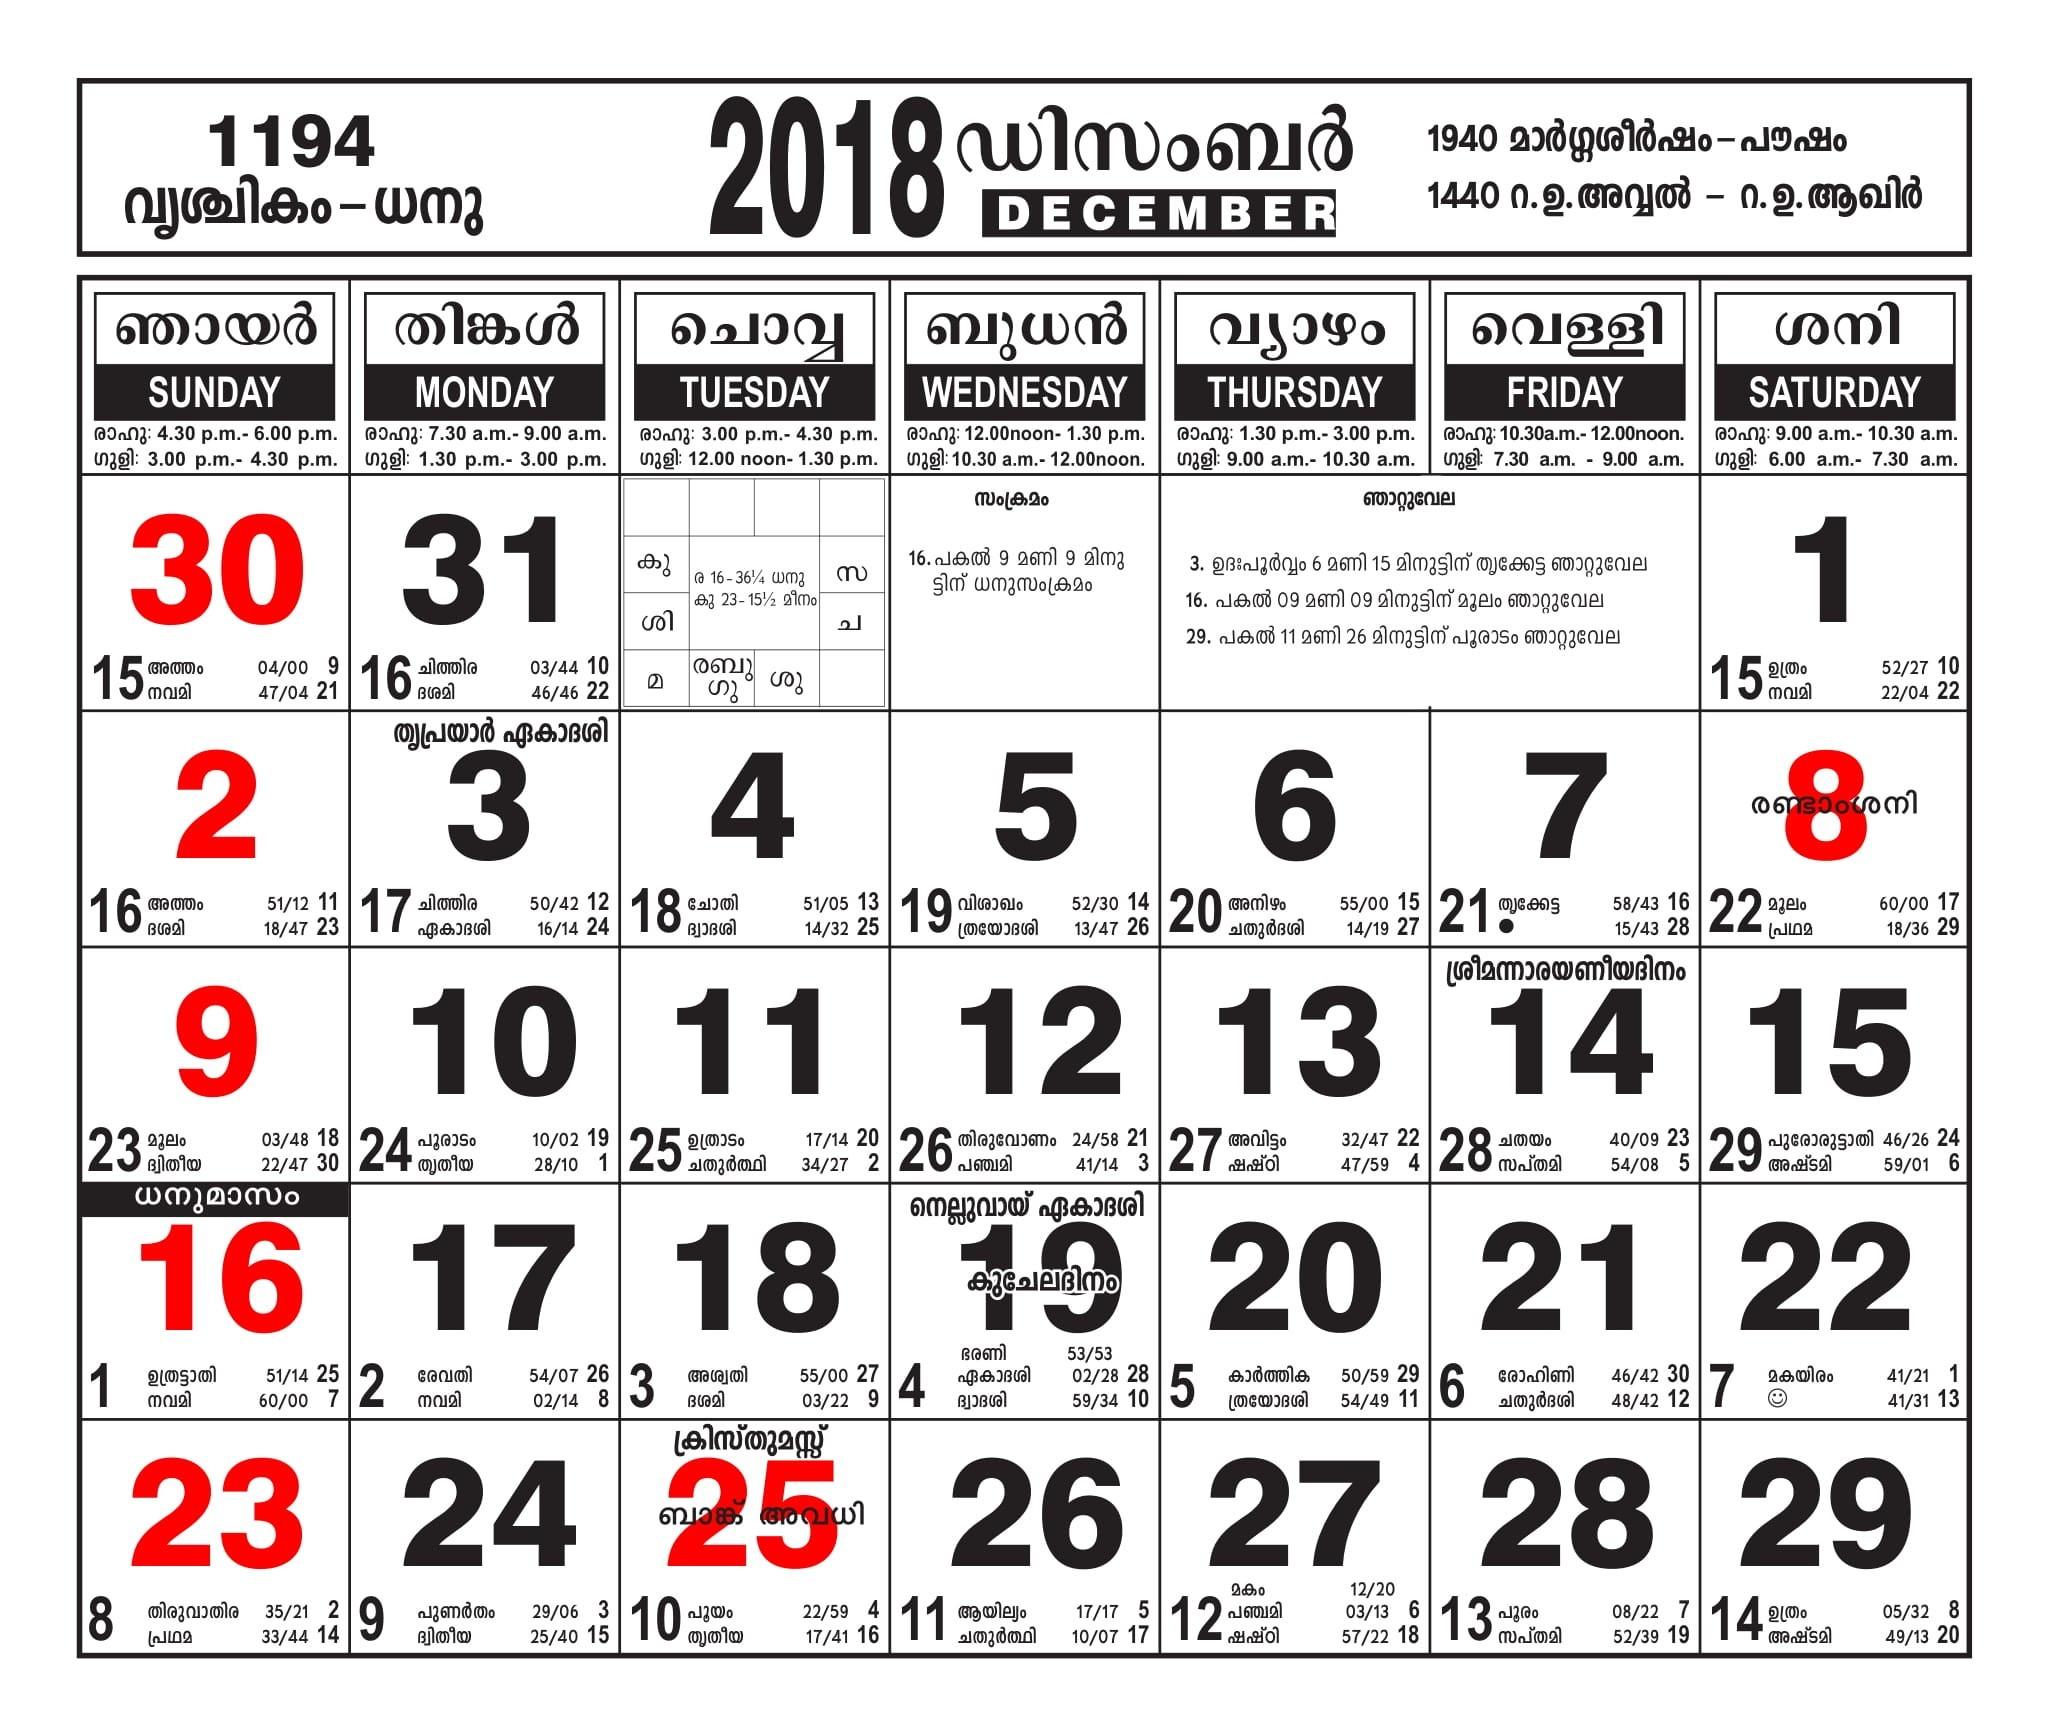 Kerala Government Calendar 2020 Pdf - Template Calendar Design  Manorama Calender Octobe 2021